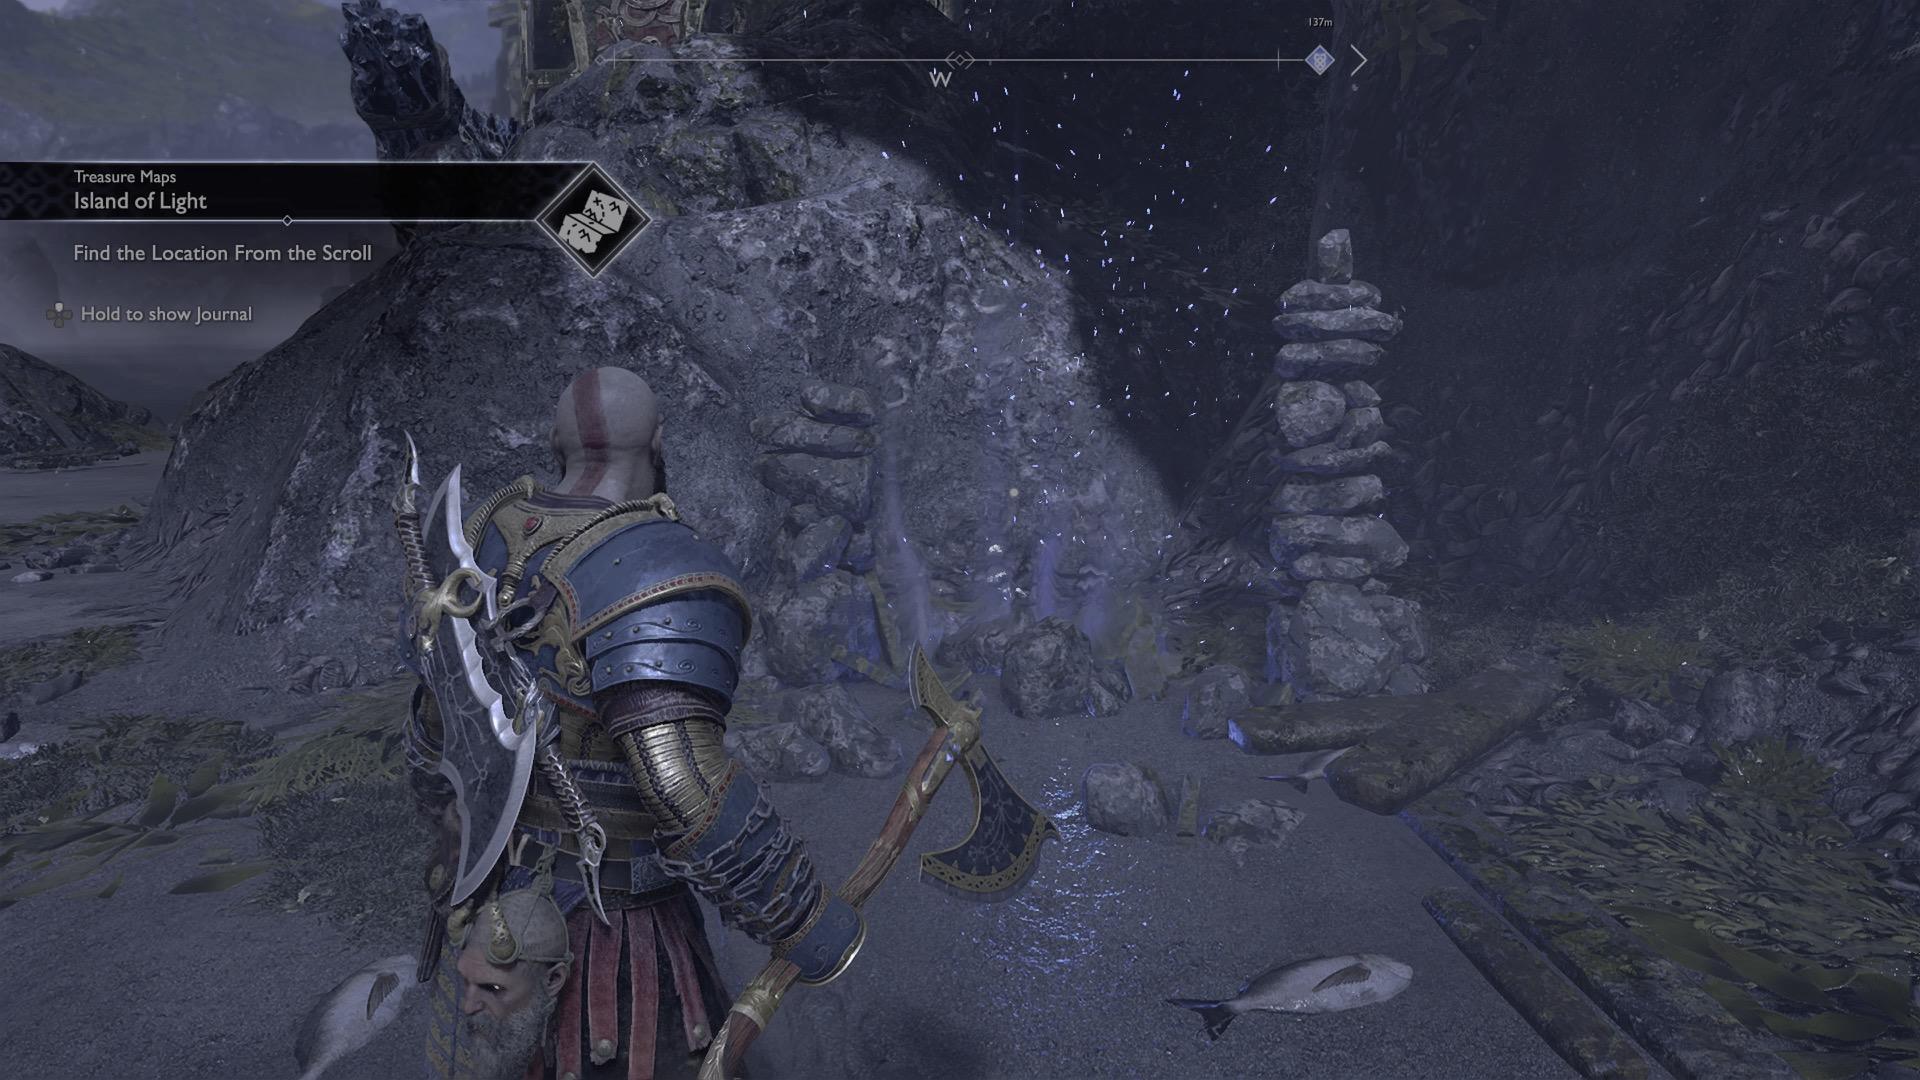 God of War guide: Island of Light treasure map location